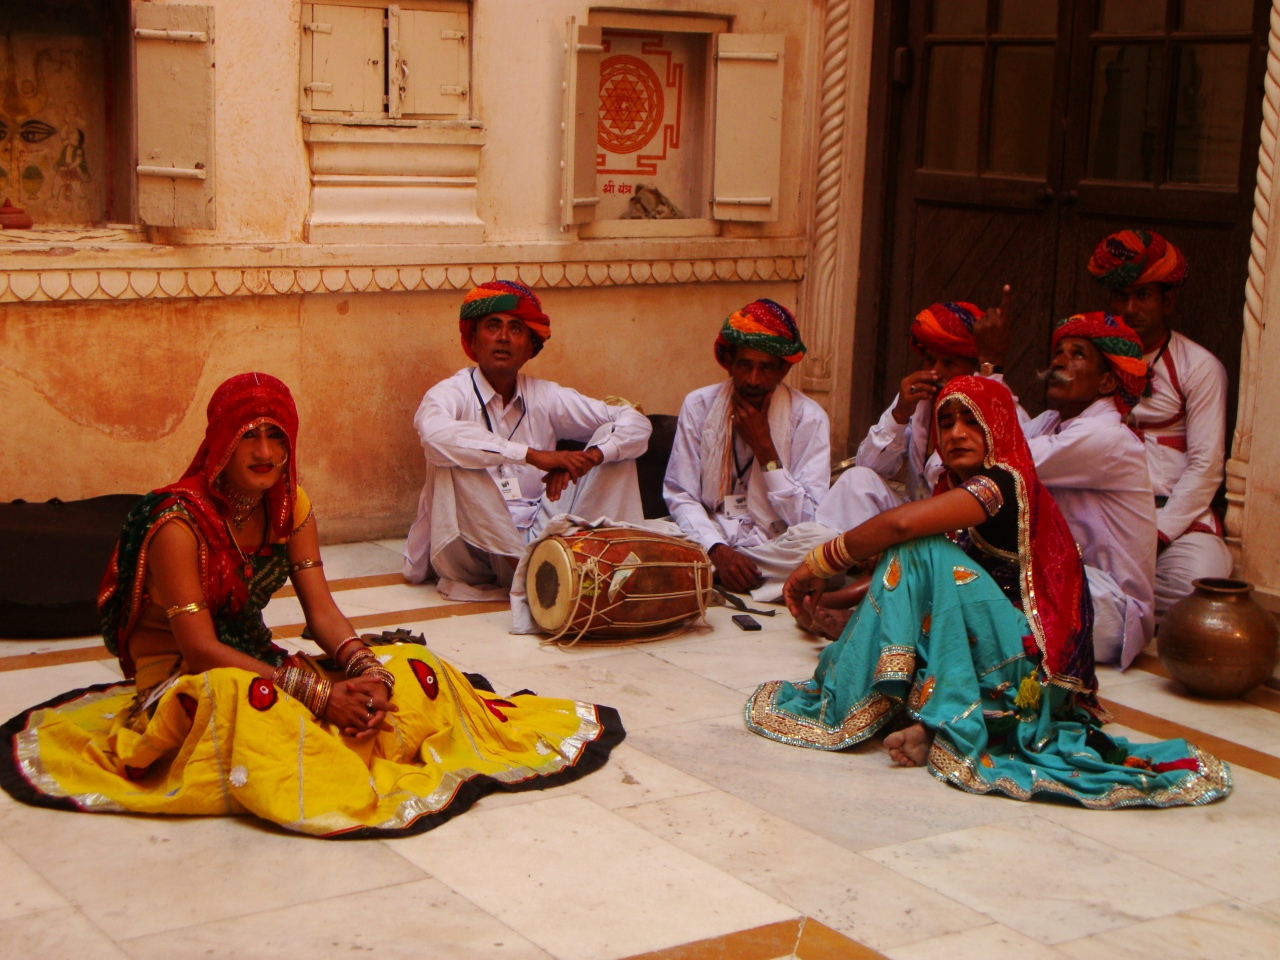 Dances with Eunuchs: The BlueCity